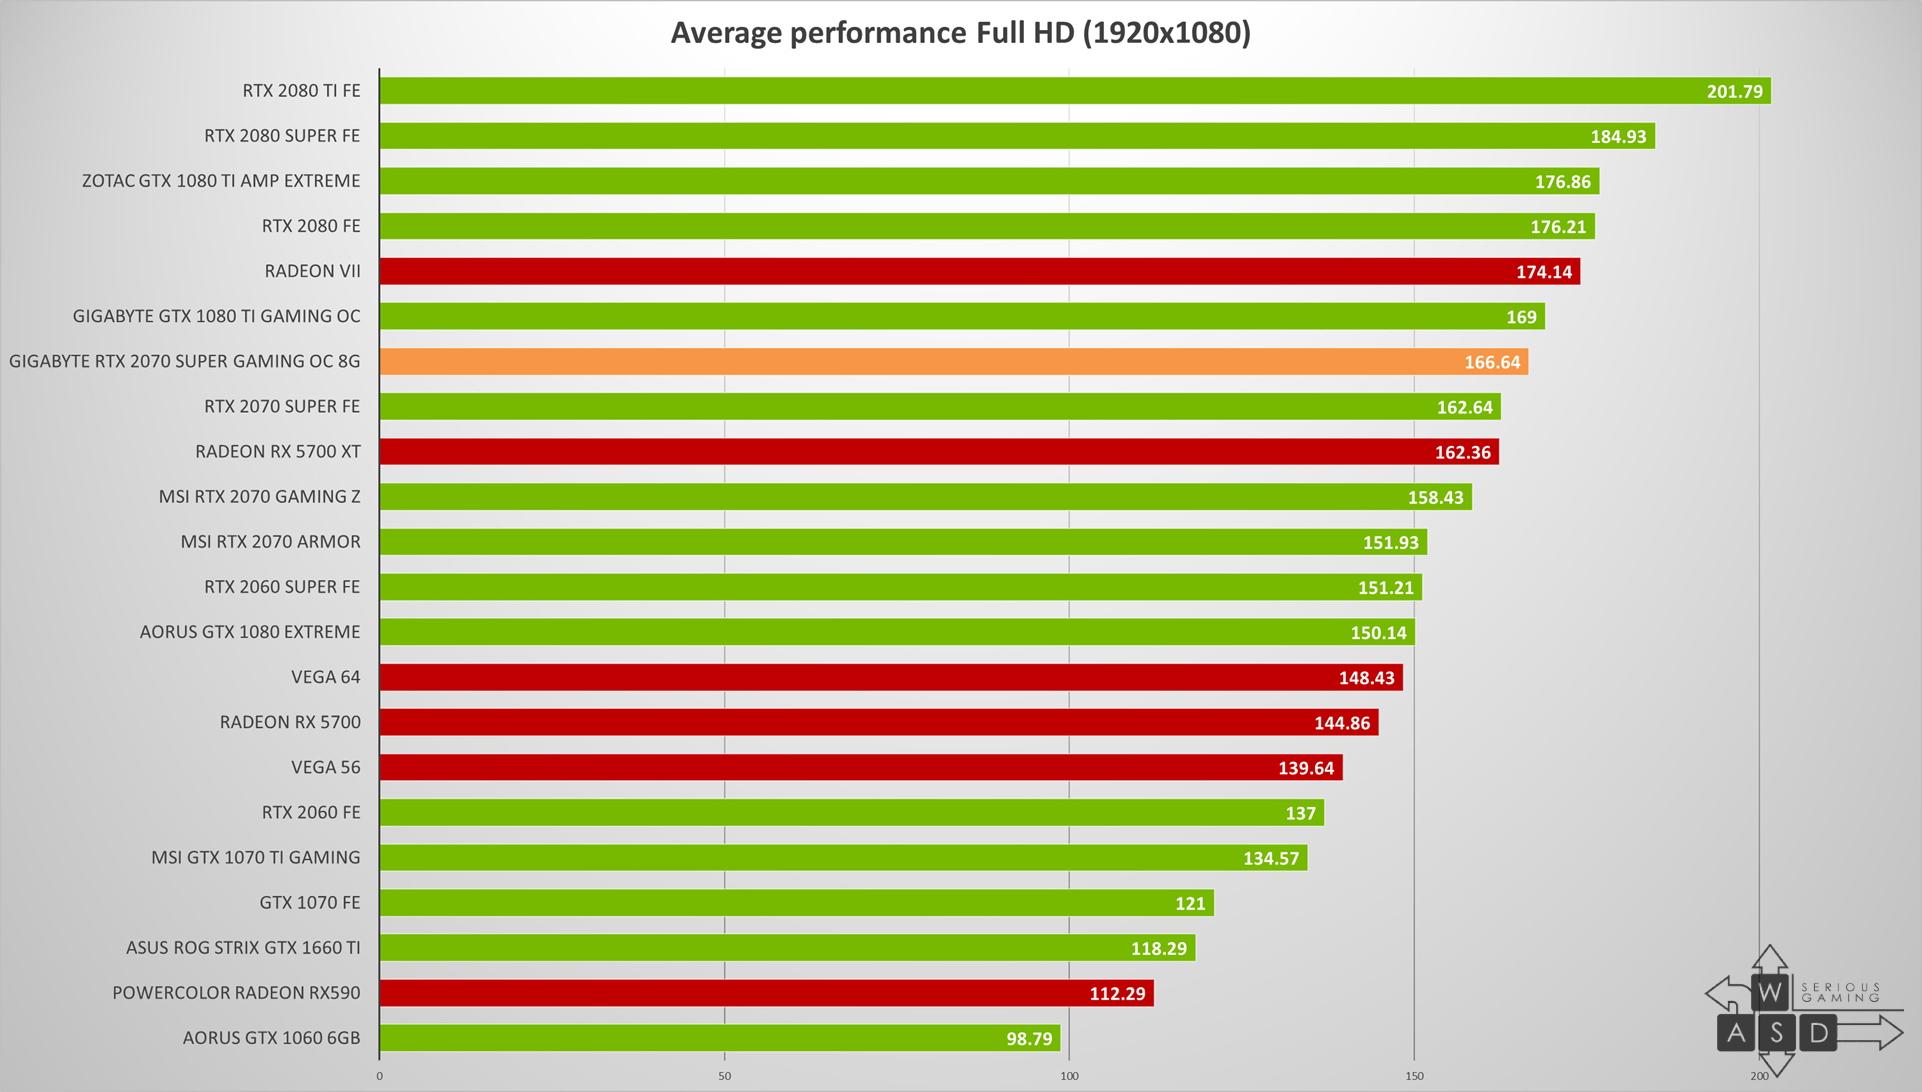 Gigabyte GeForce RTX 2070 Super Gaming OC 8G review | WASD